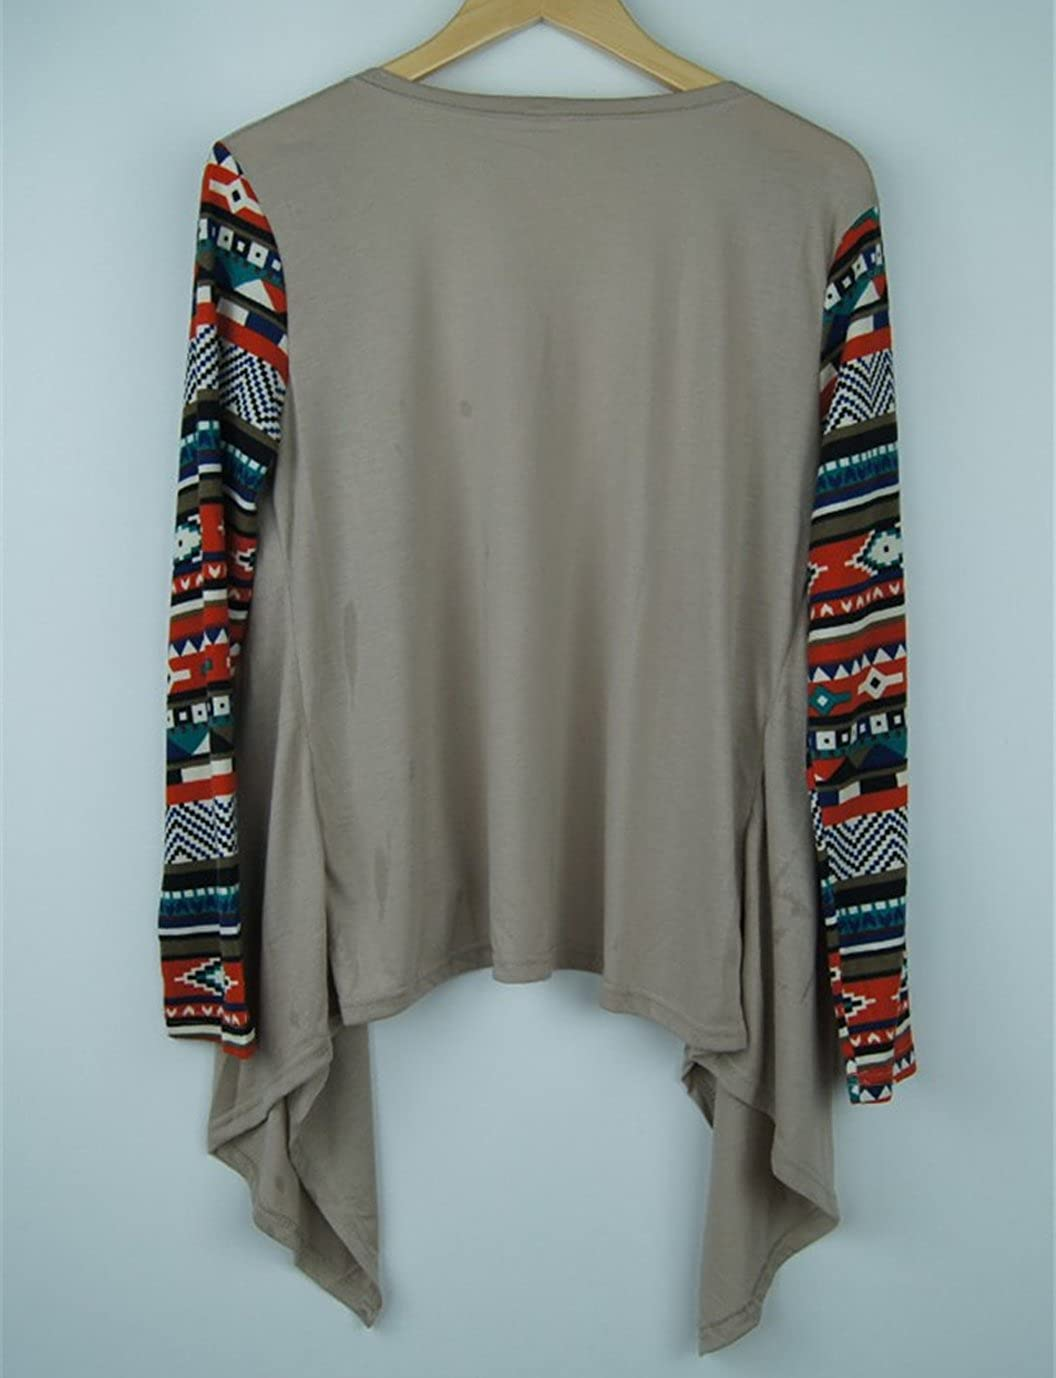 Damen Strickjacke Cardigan Langarmshirt Geometrische Irregular Lose Strickmantel Strick Loose Strickjacke Kimono Pullover Mantel Outwear Tops Khaki